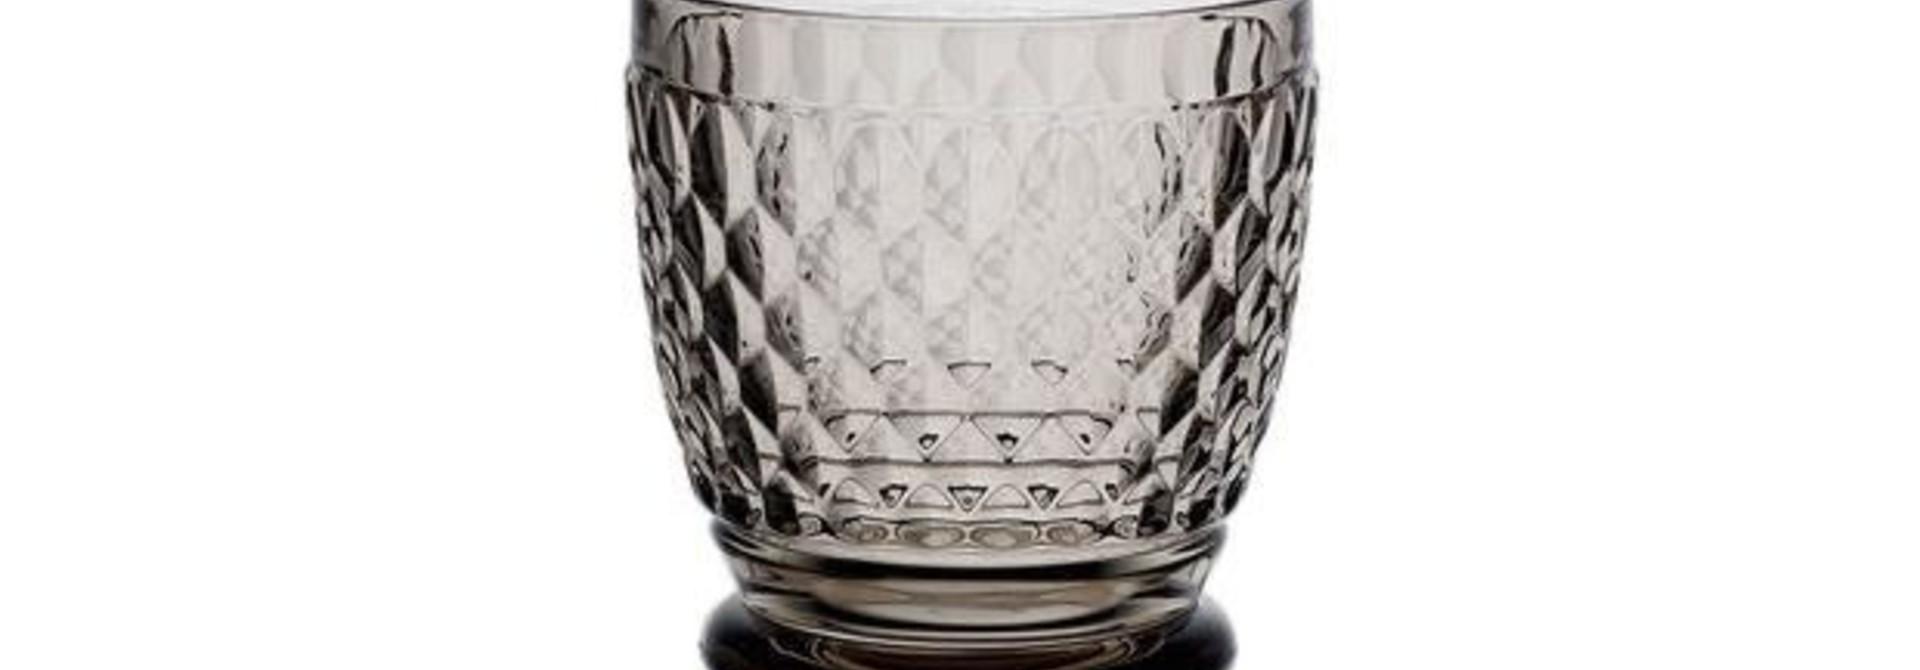 VILLEROY & BOCH - Glass Water Boston Smoked